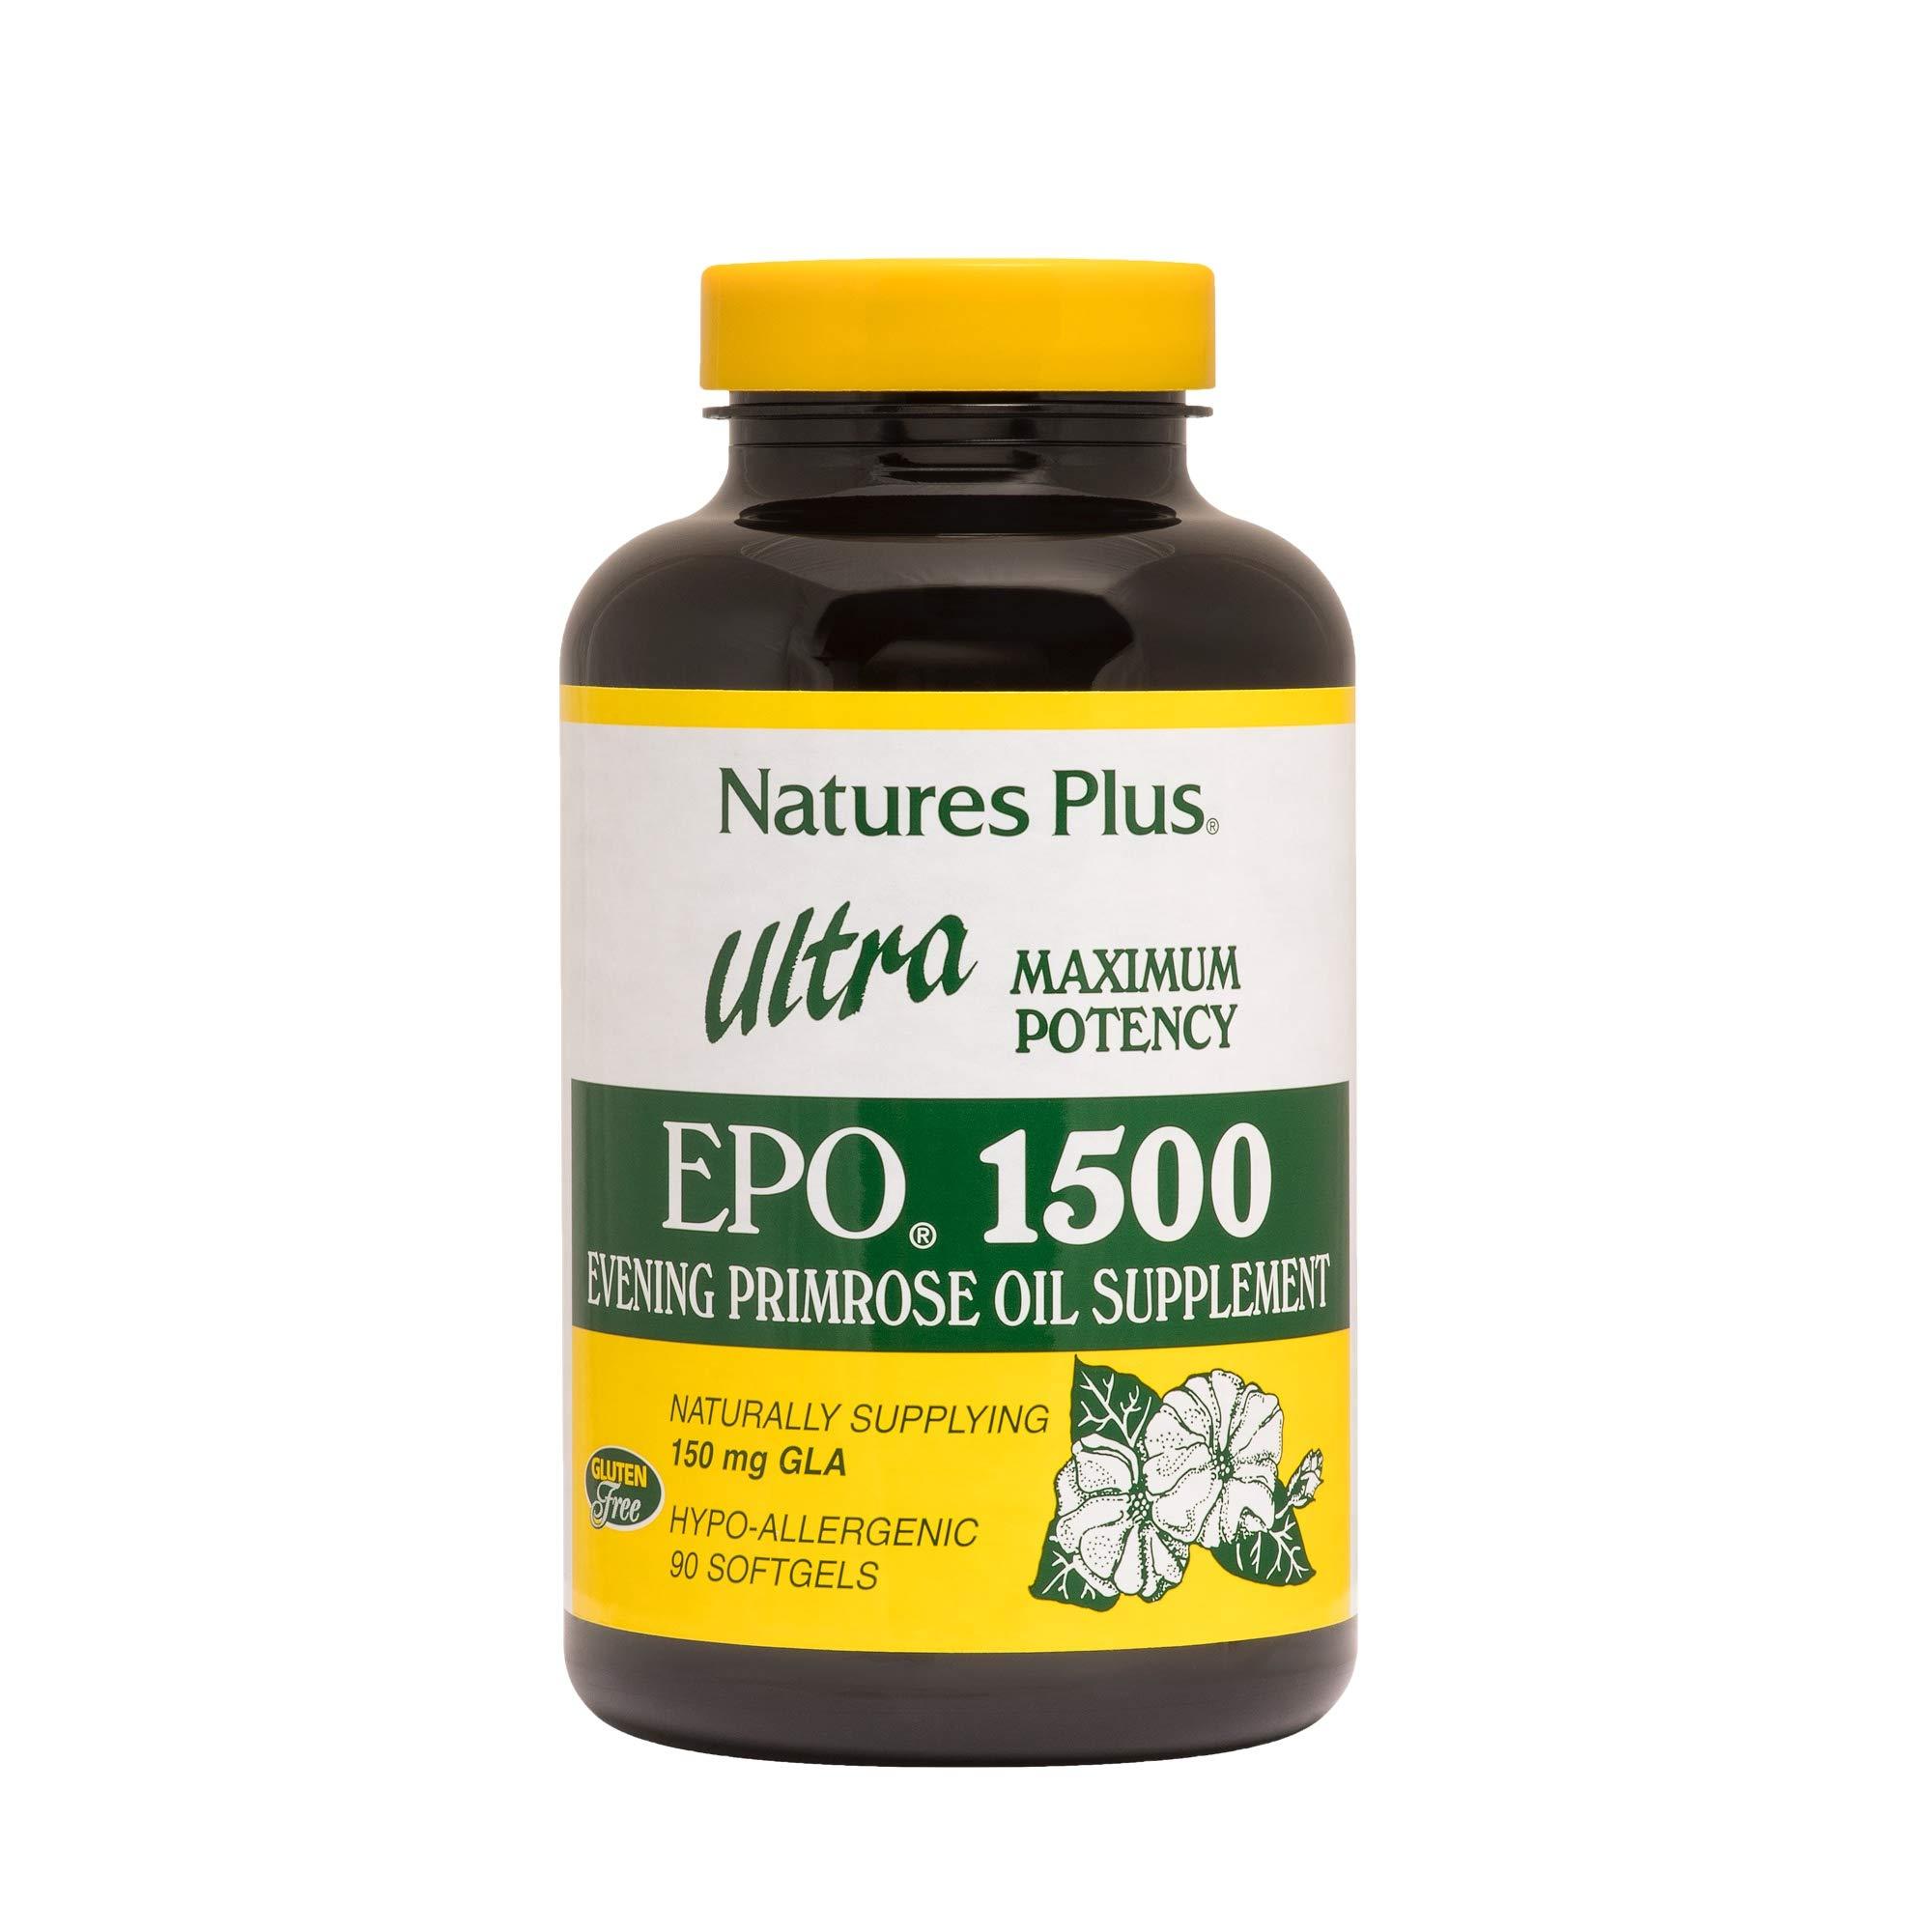 NaturesPlus Ultra EPO 1500-1500 mg Evening Primrose Oil, 90 Softgels - Hormone Balance Supplement, Promotes Healthy, Clear Skin, Anti-Aging, Antioxidant - Gluten-Free - 90 Servings